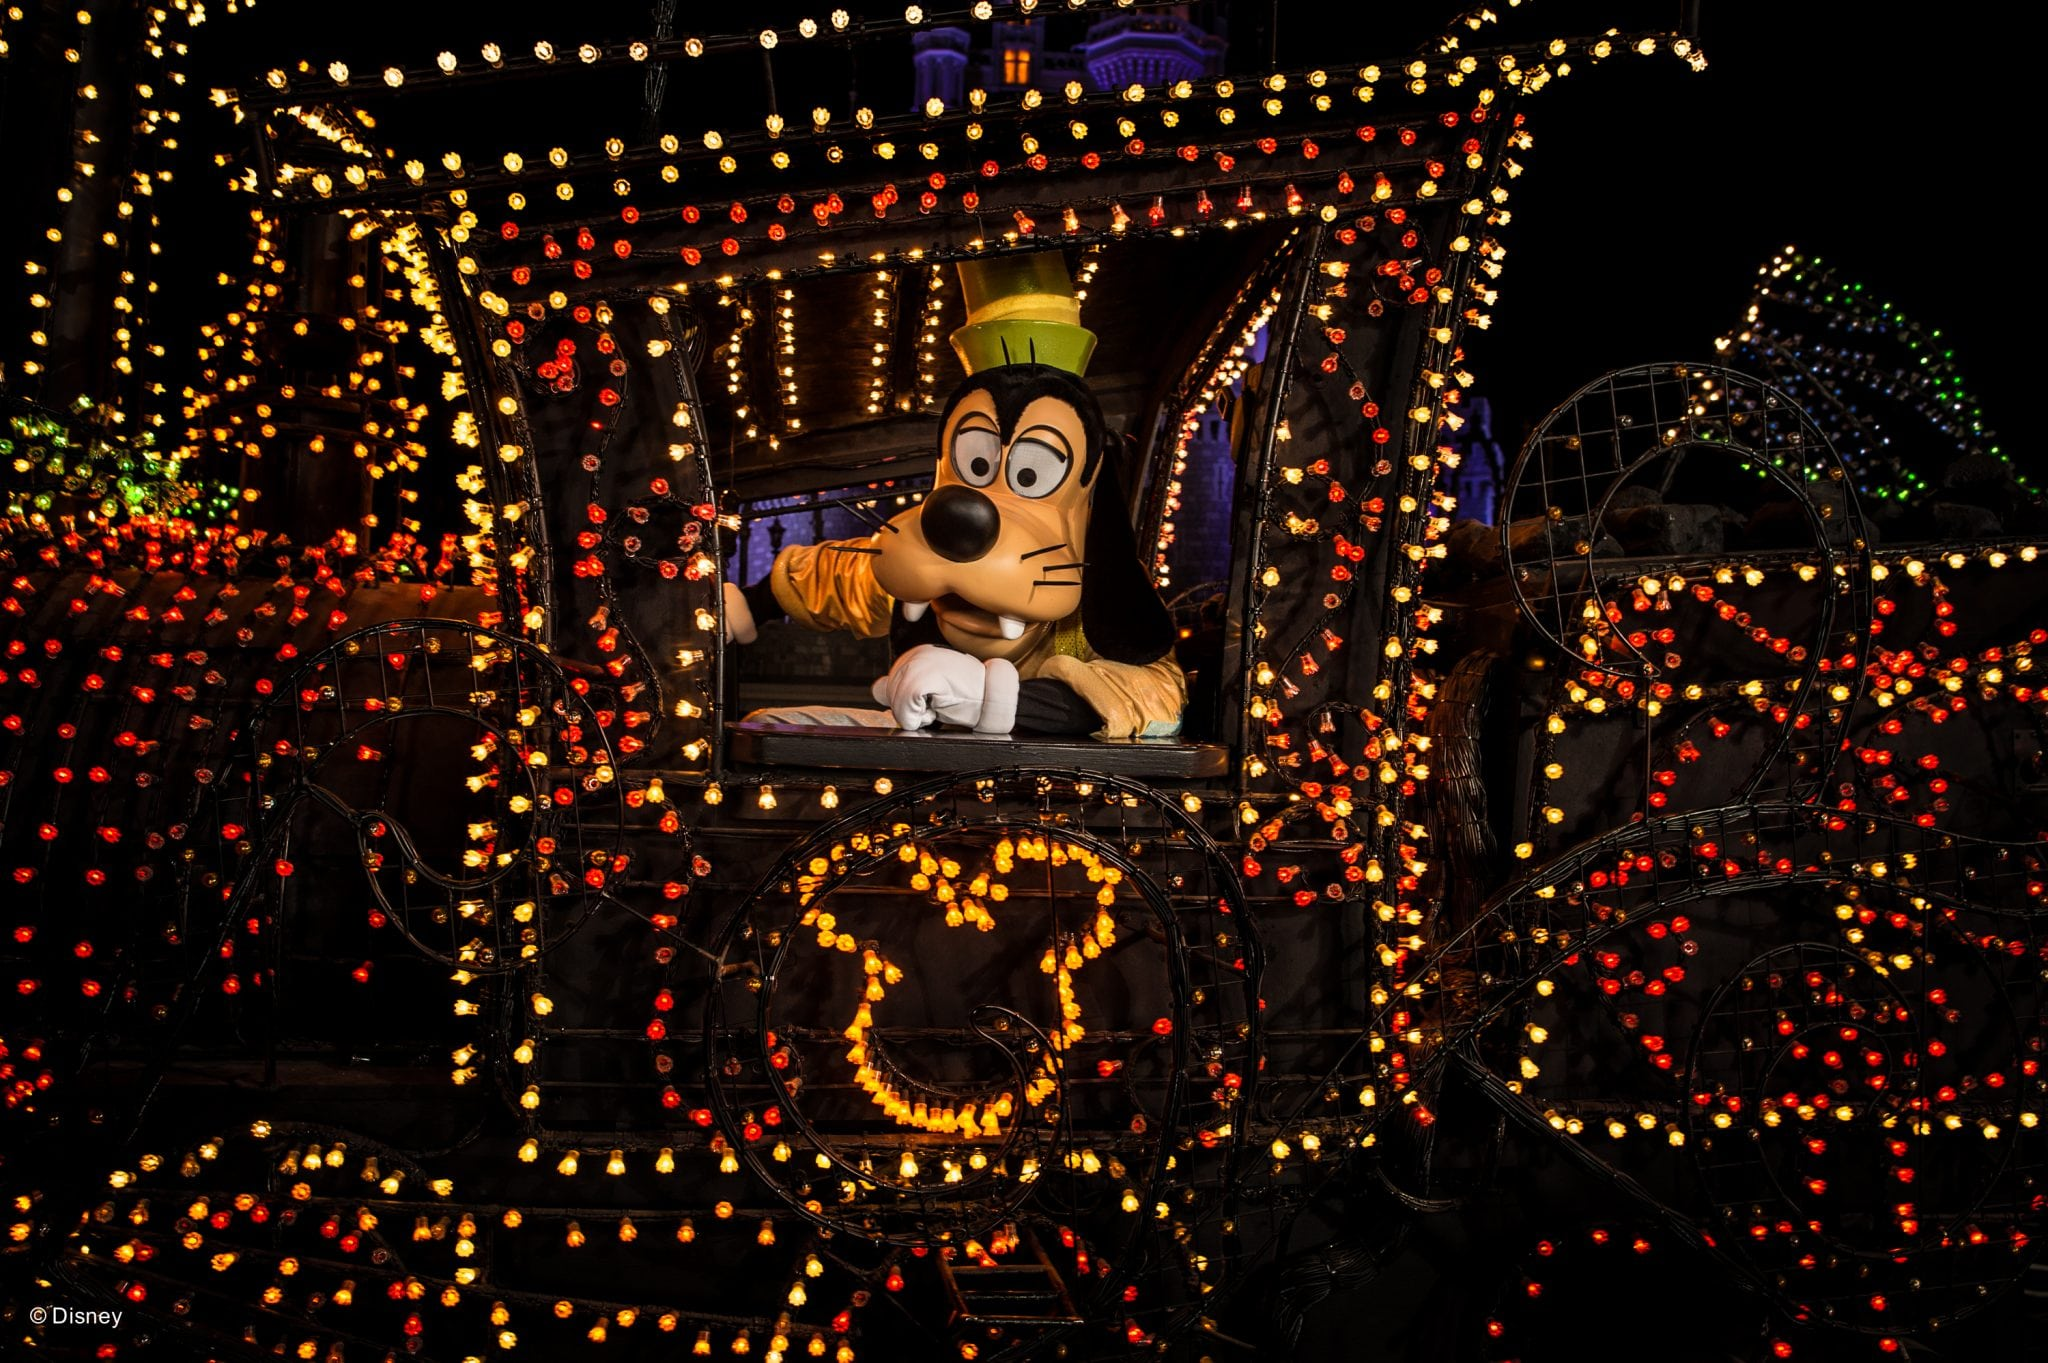 Disneyland's Main Street Electrical Light Parade